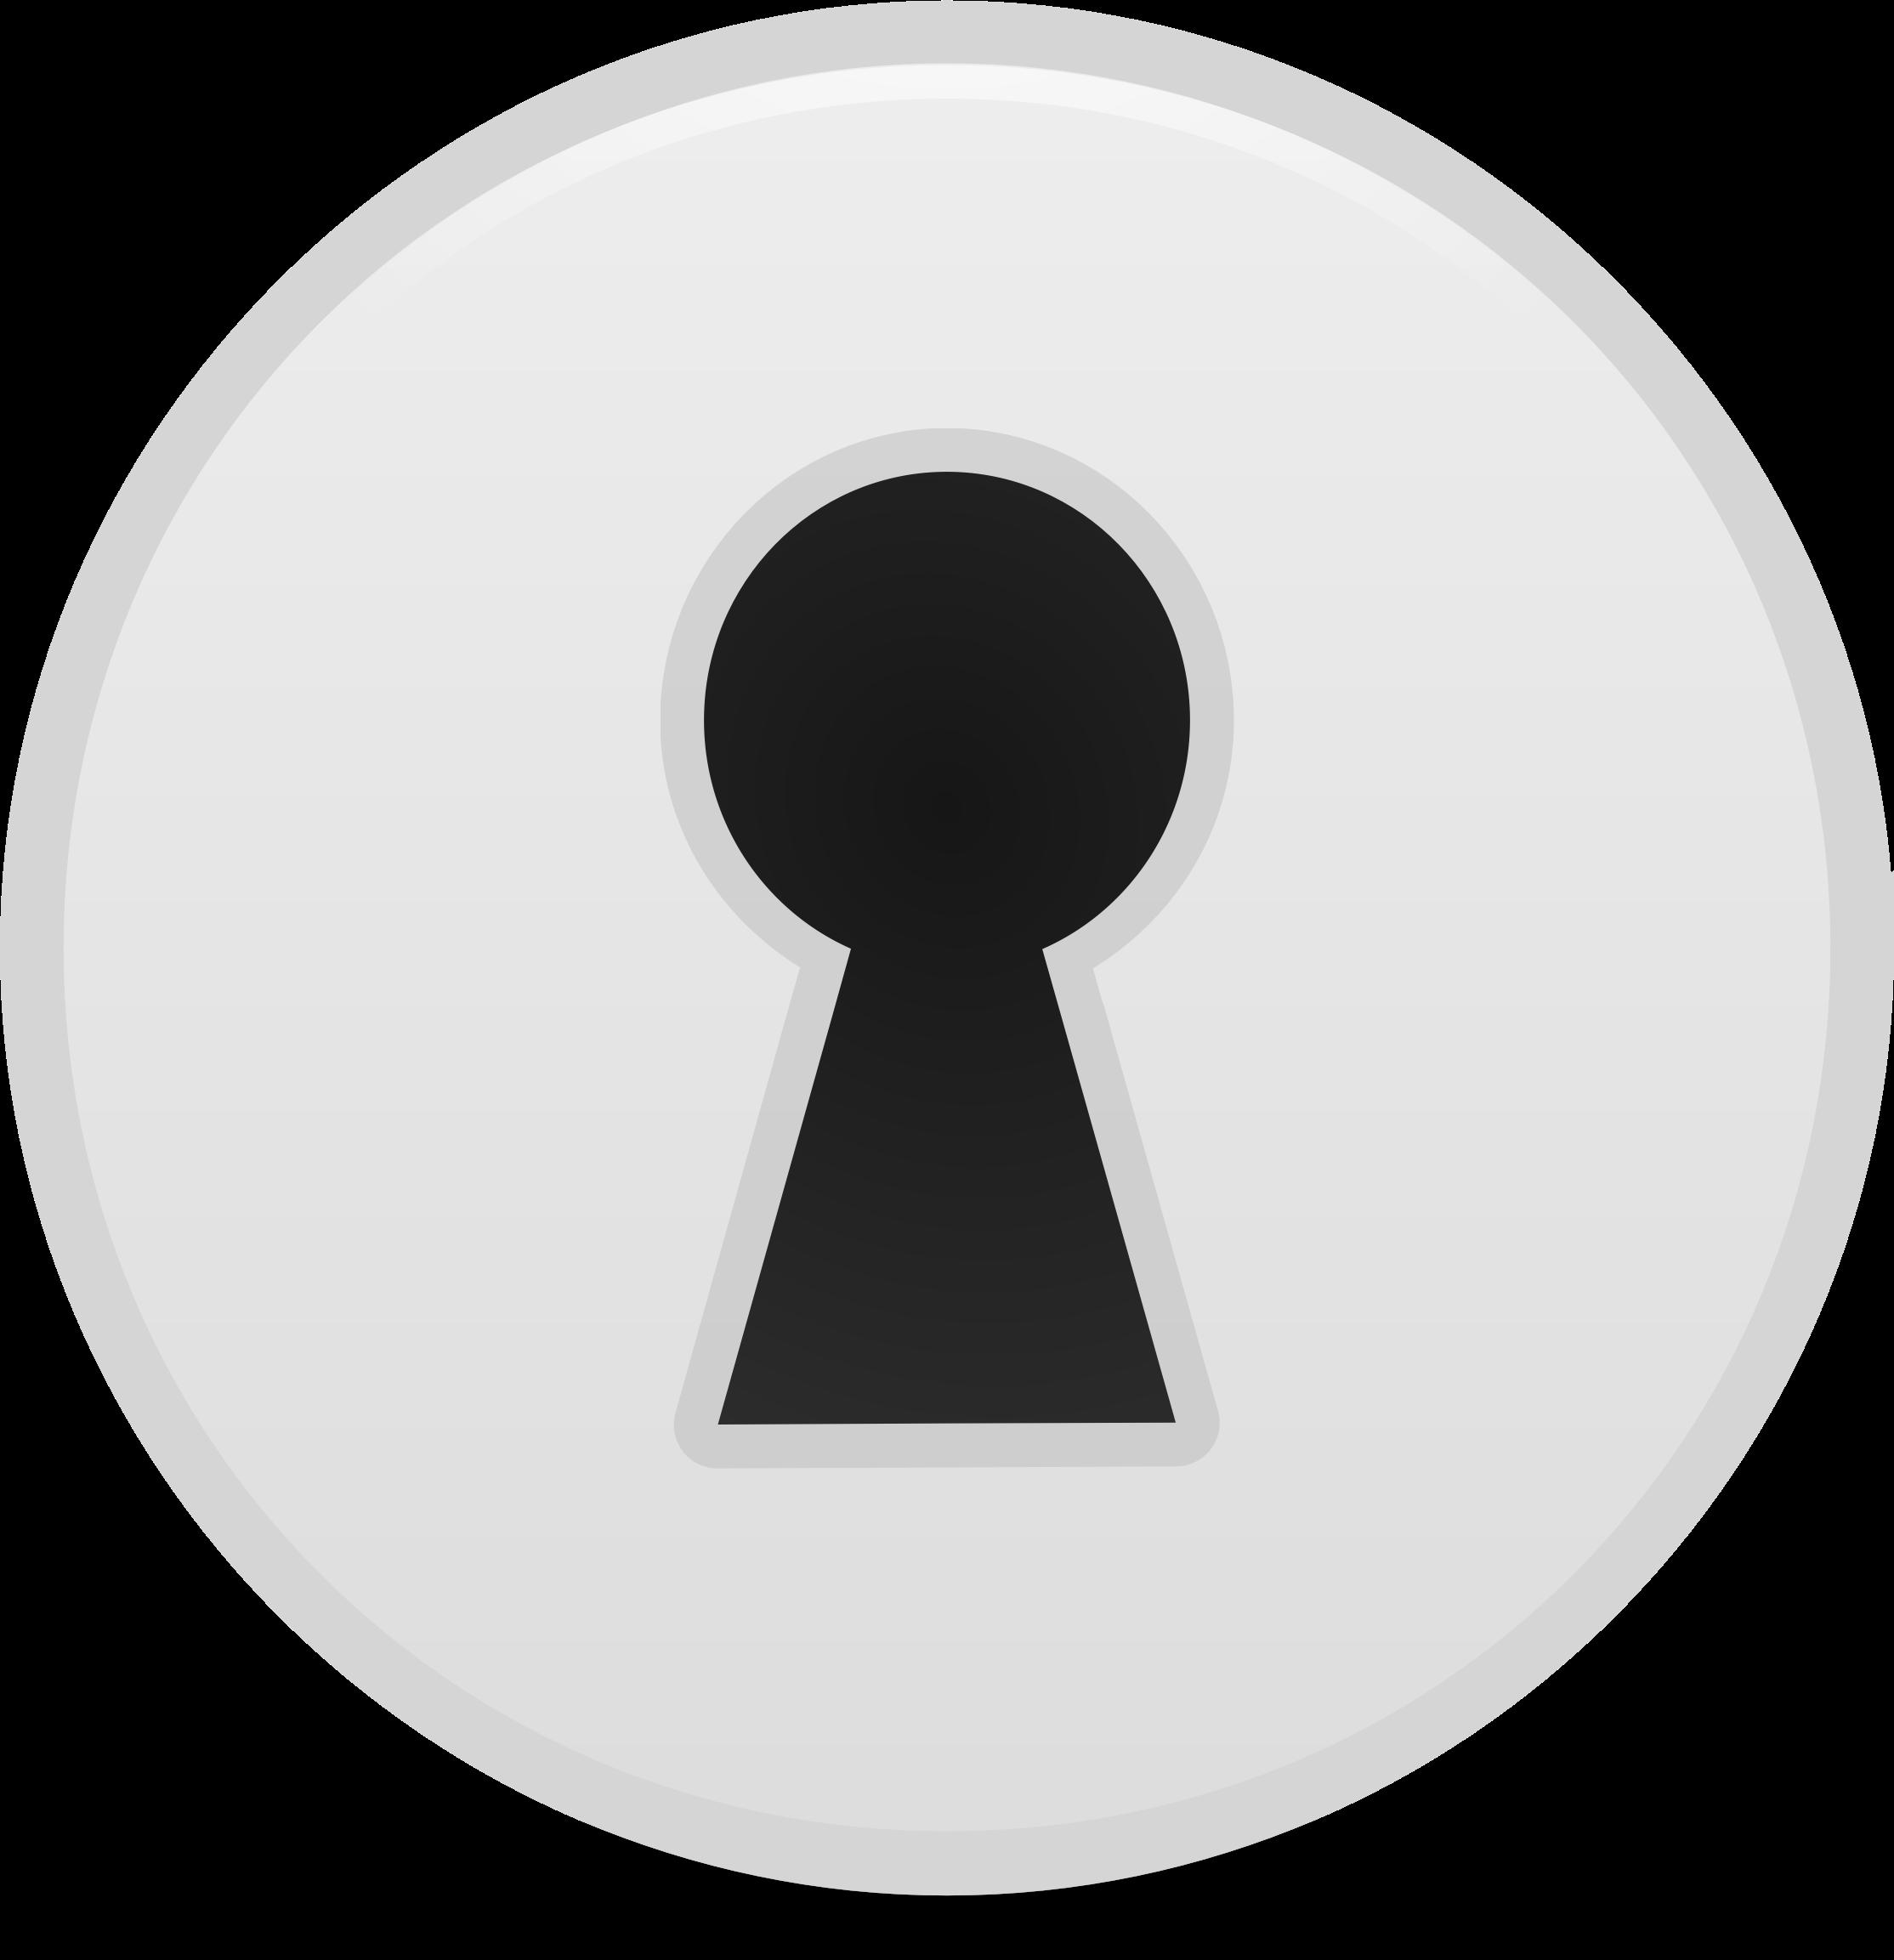 Key emblem big image. Keys clipart password